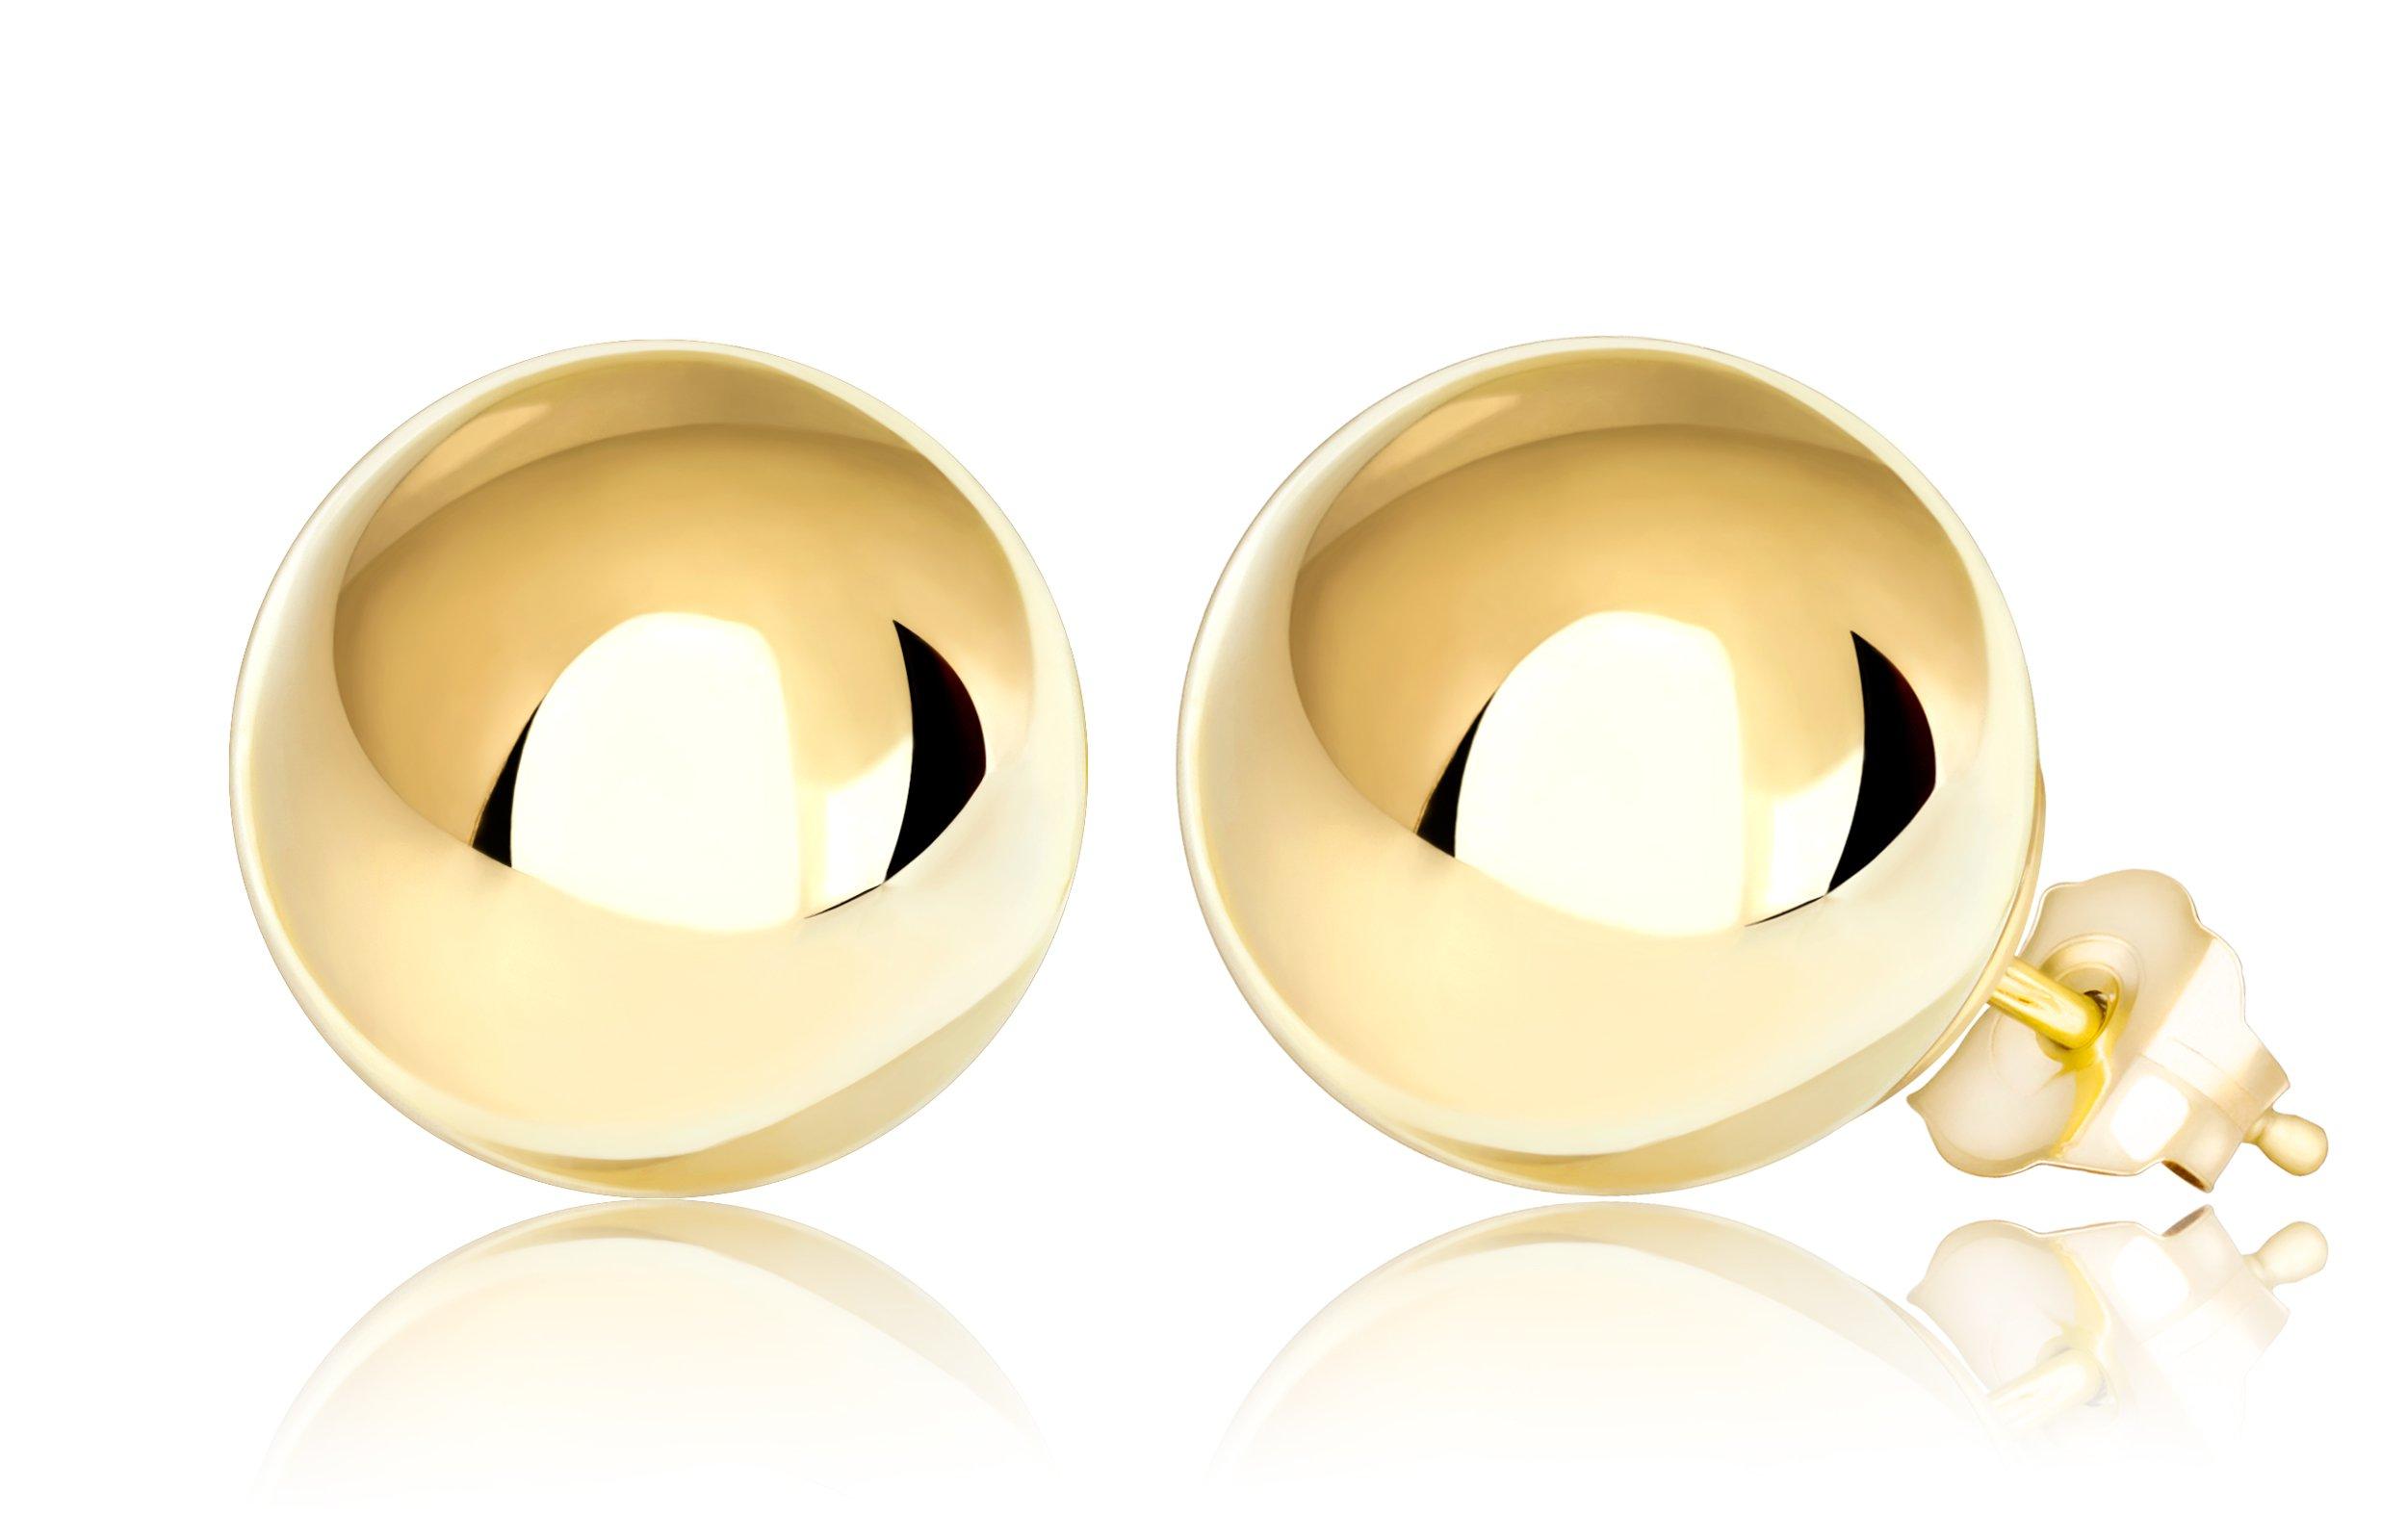 Premium 14K Yellow Gold Ball Stud Earrings (10mm - Yellow Gold)